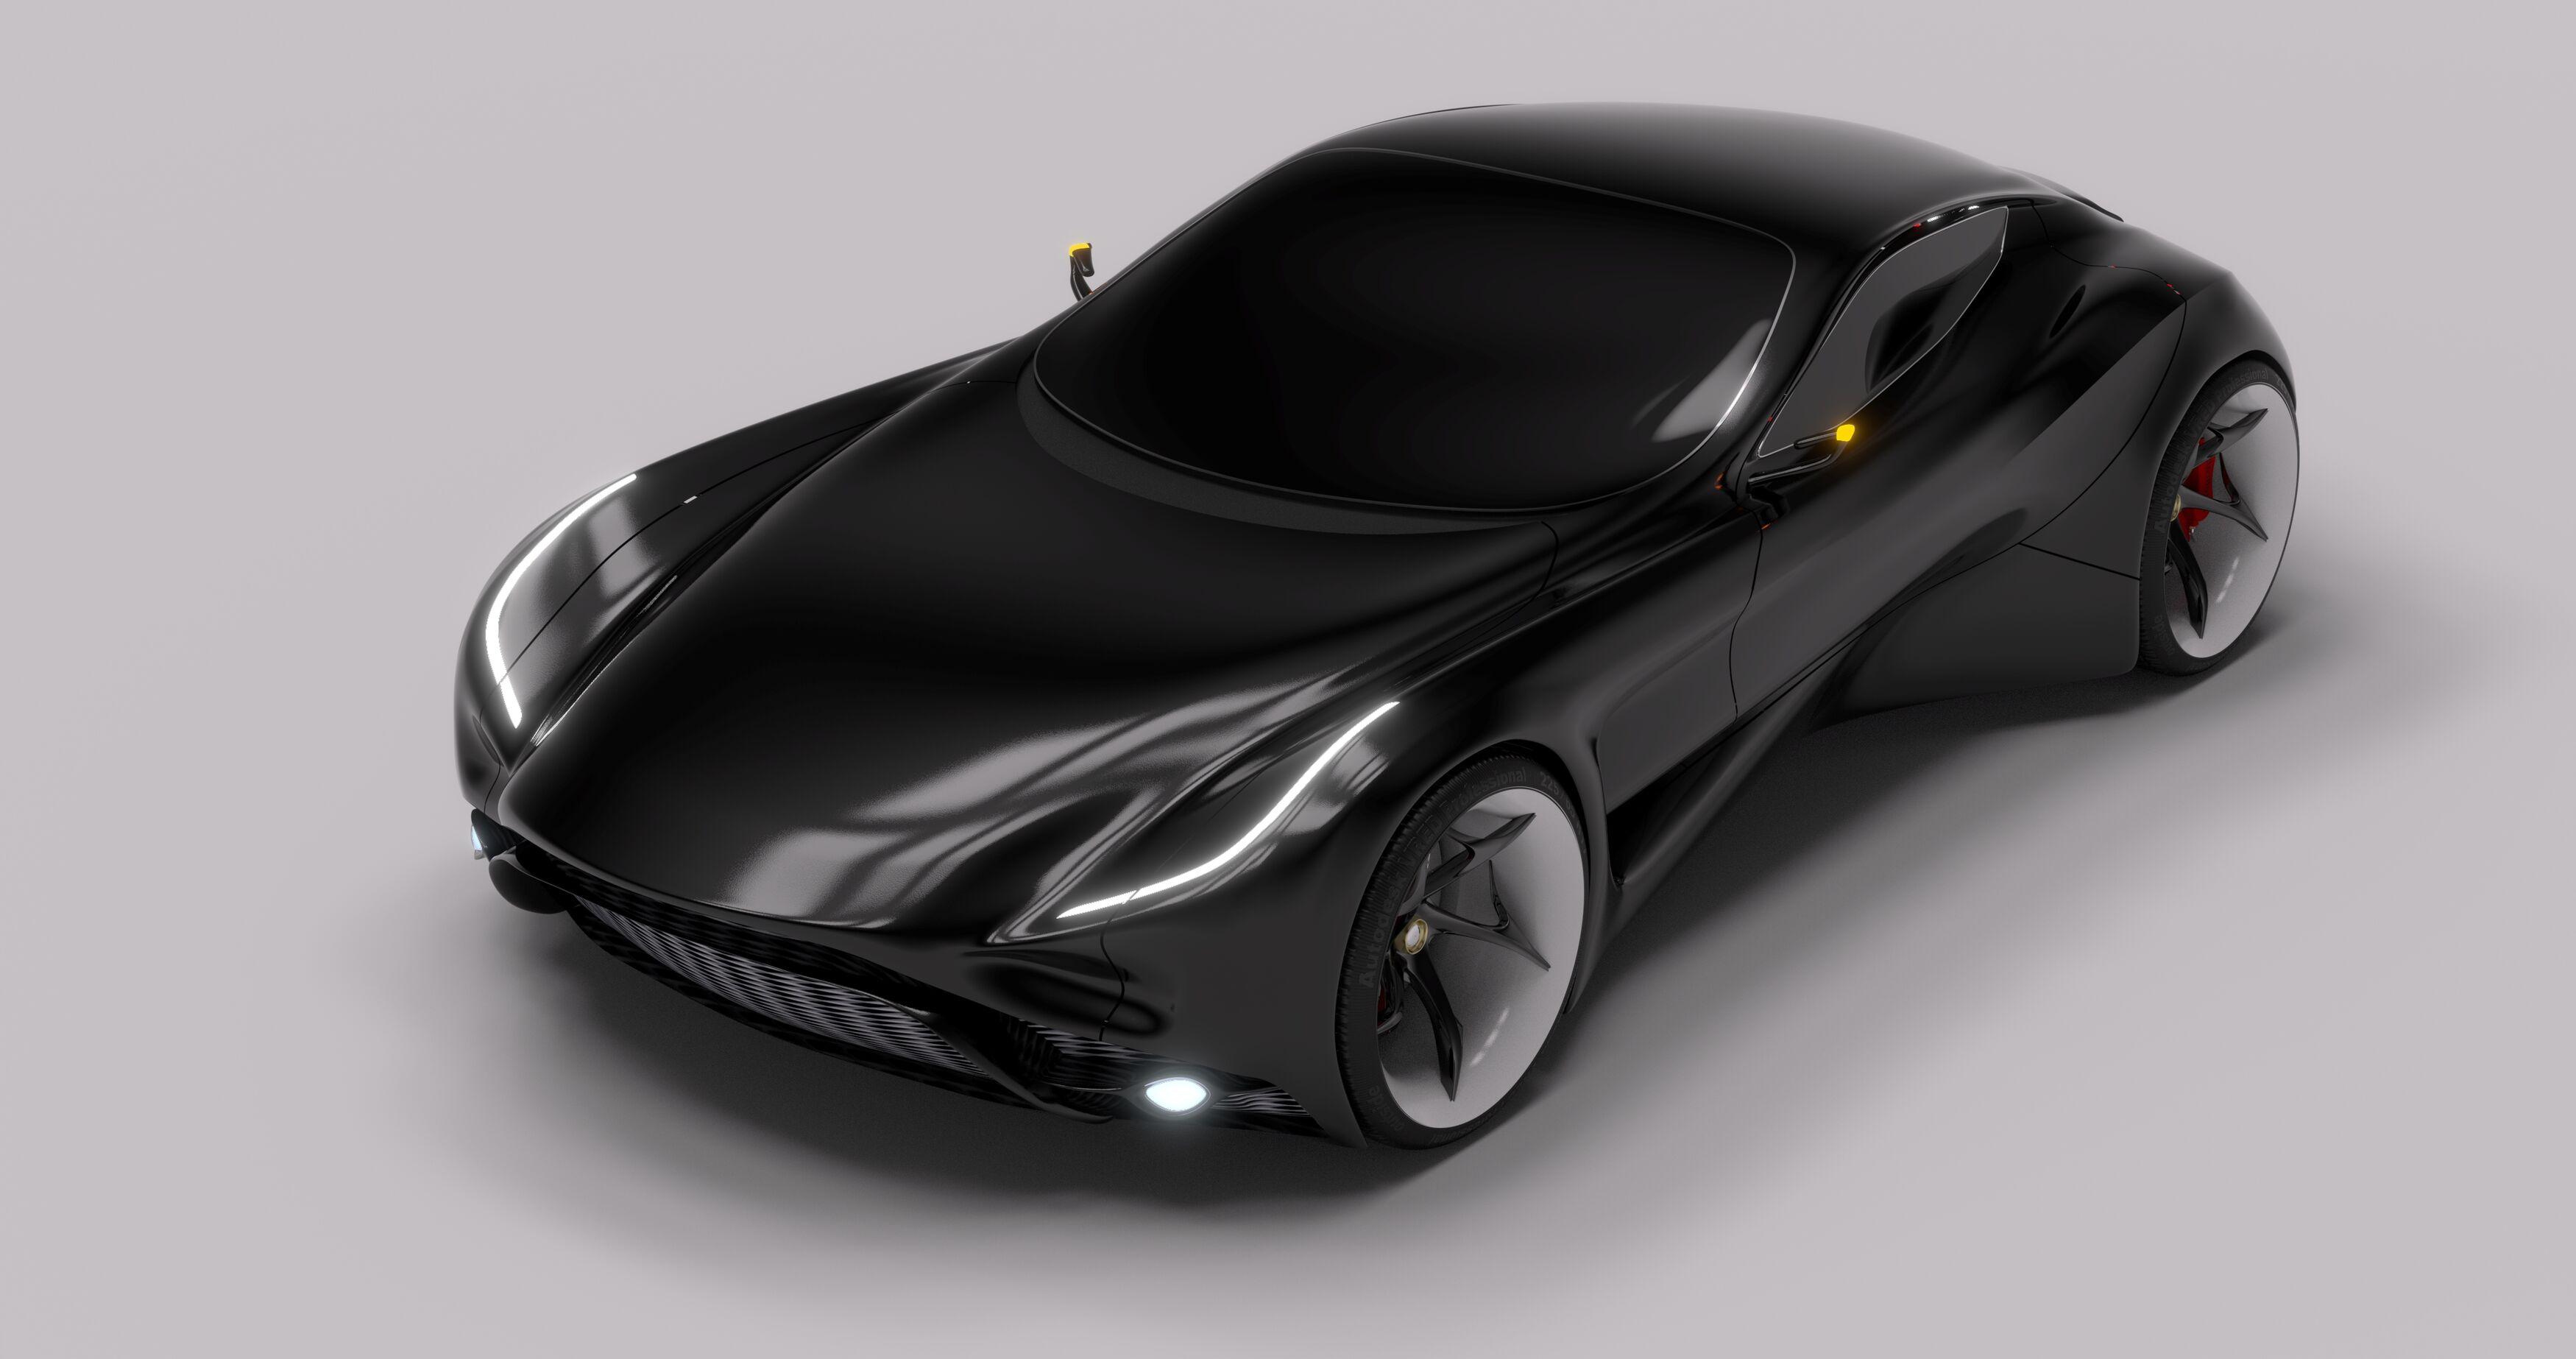 Aston-martin-db-zagato-x-4-3500-3500